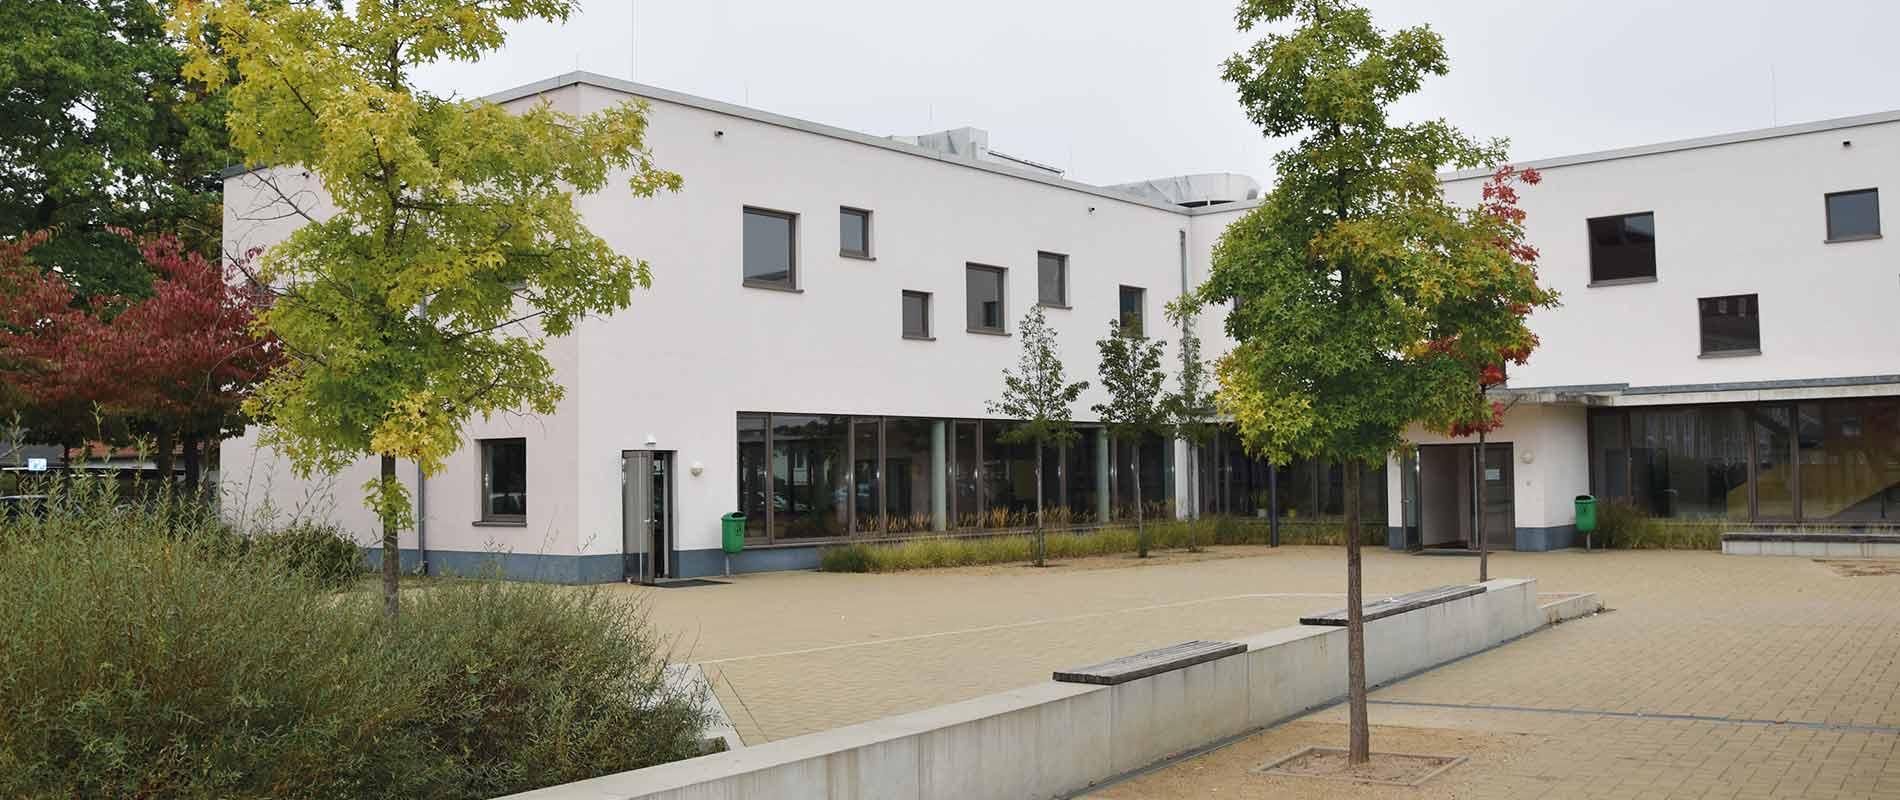 Neubau Gesamtschule Woltersdorf